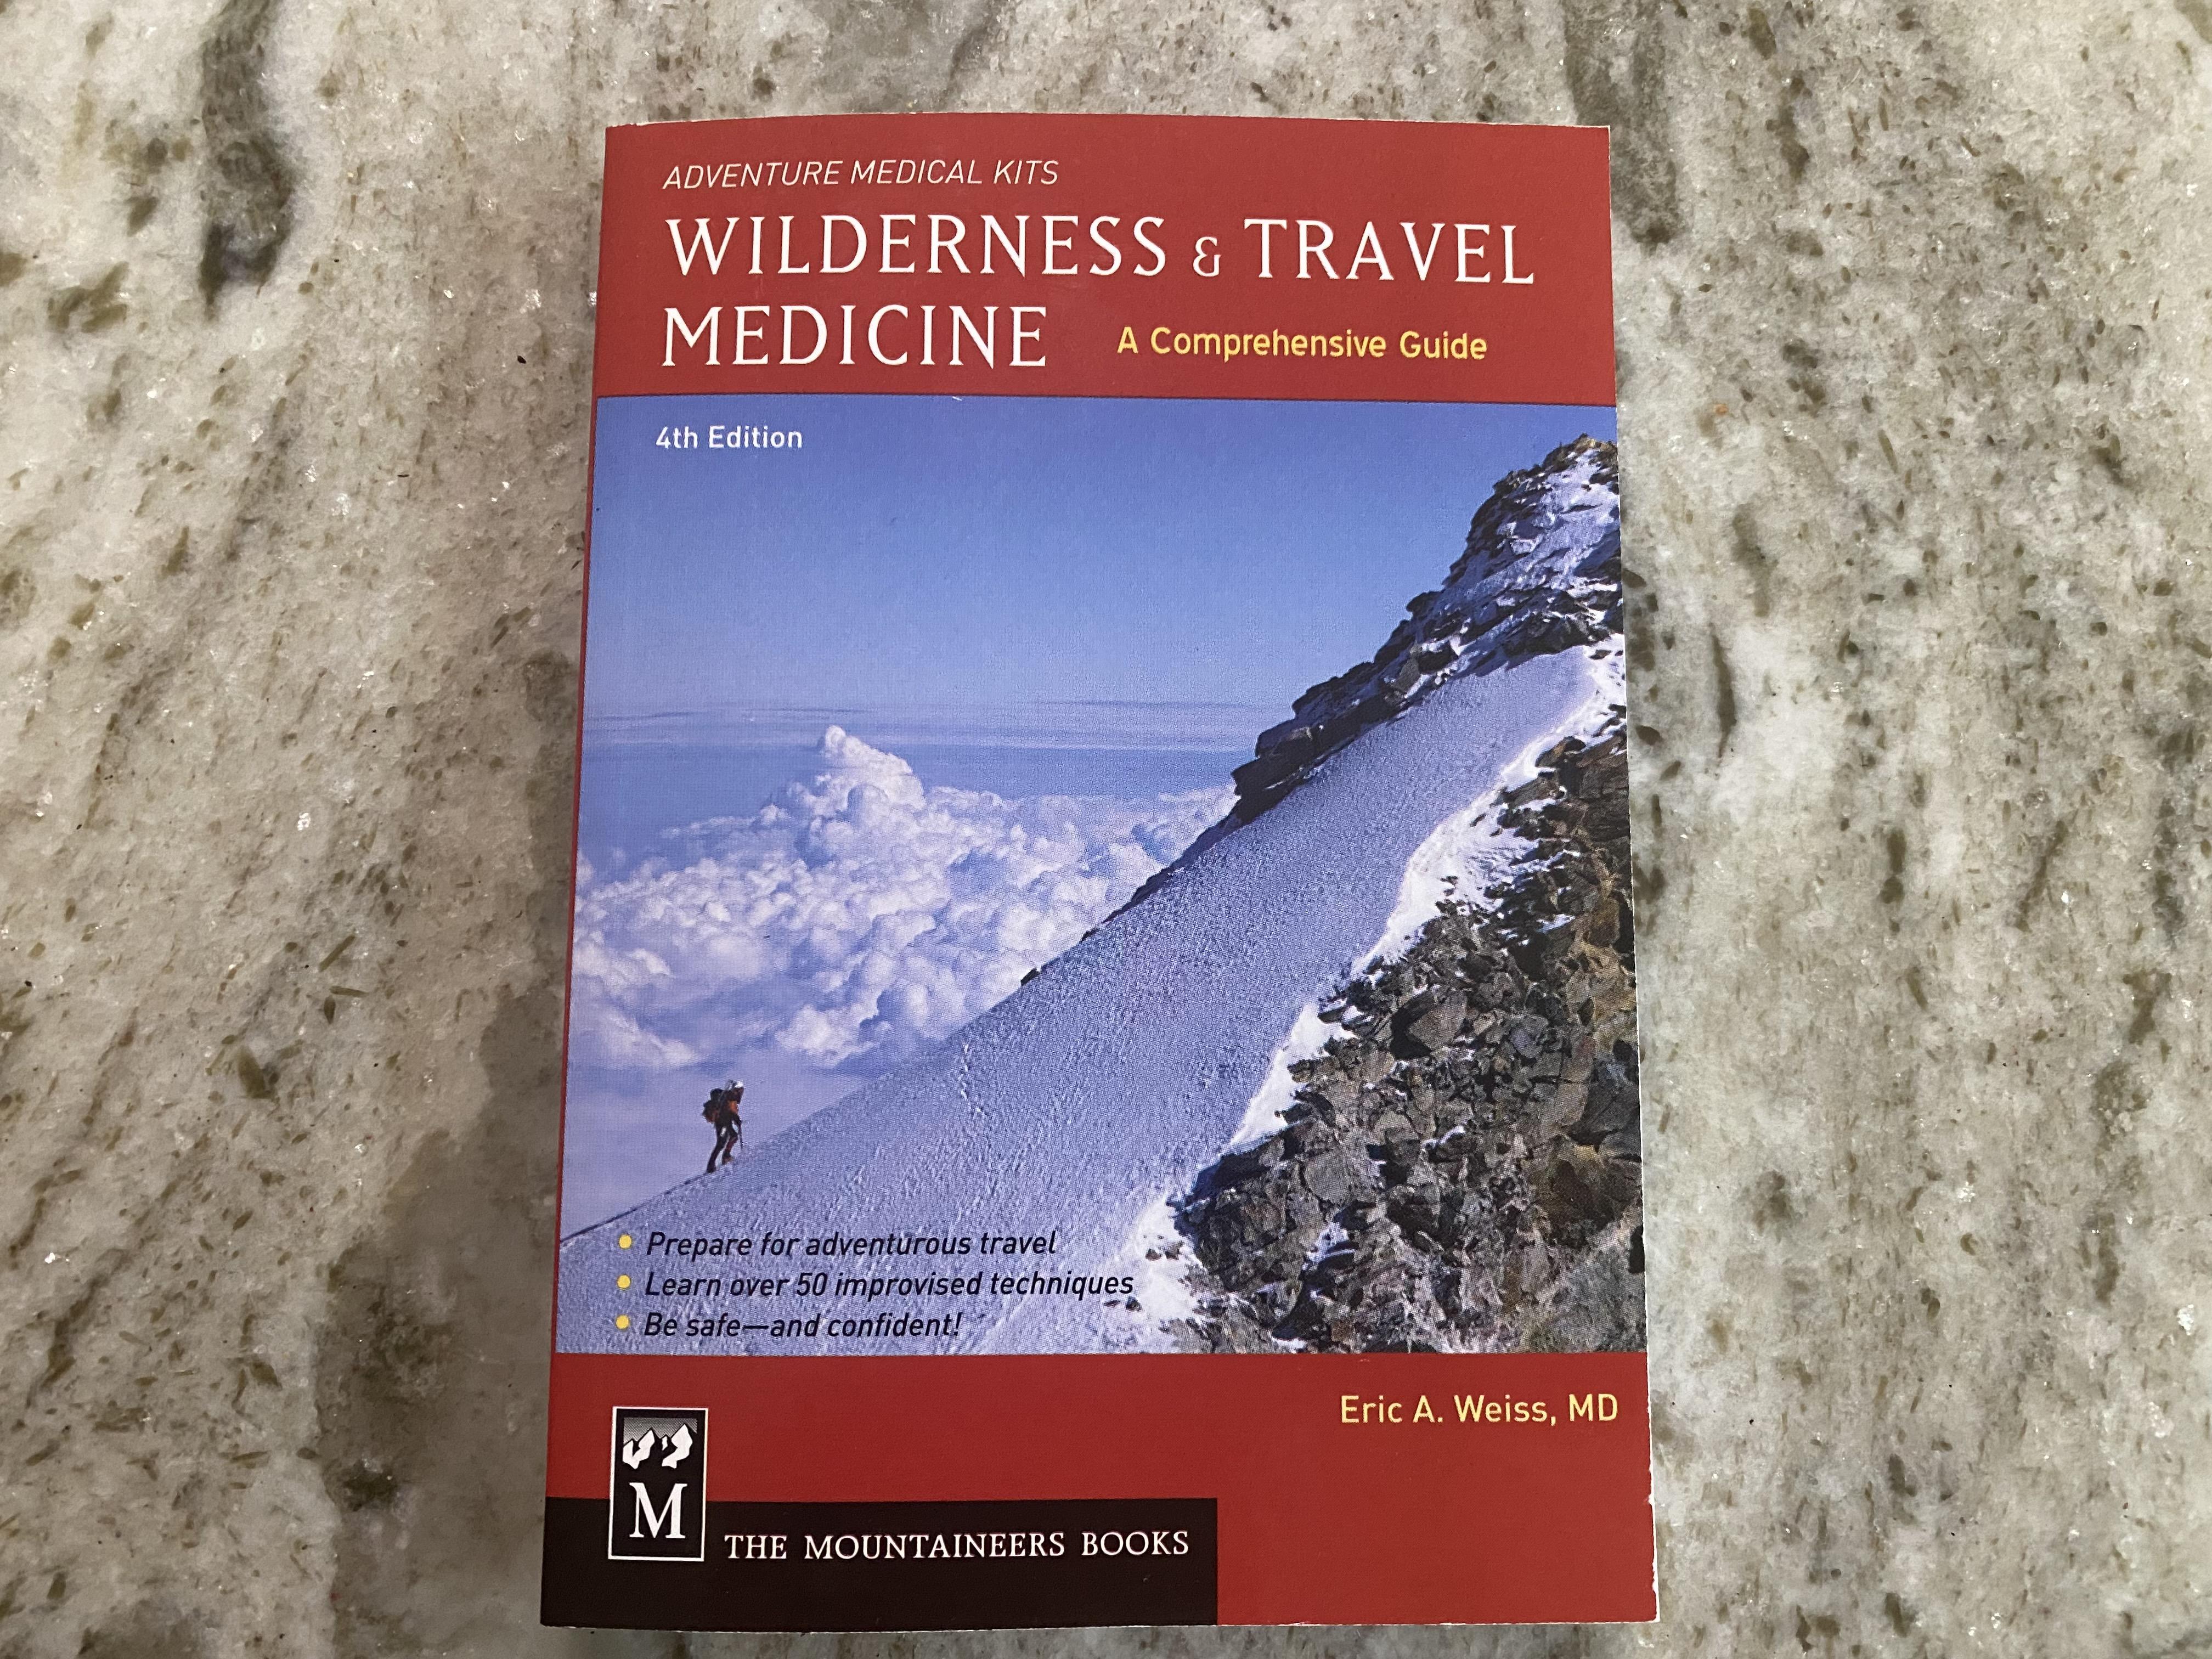 Adventure Medical Kits MOLLE Trauma Kit 1.0 Review